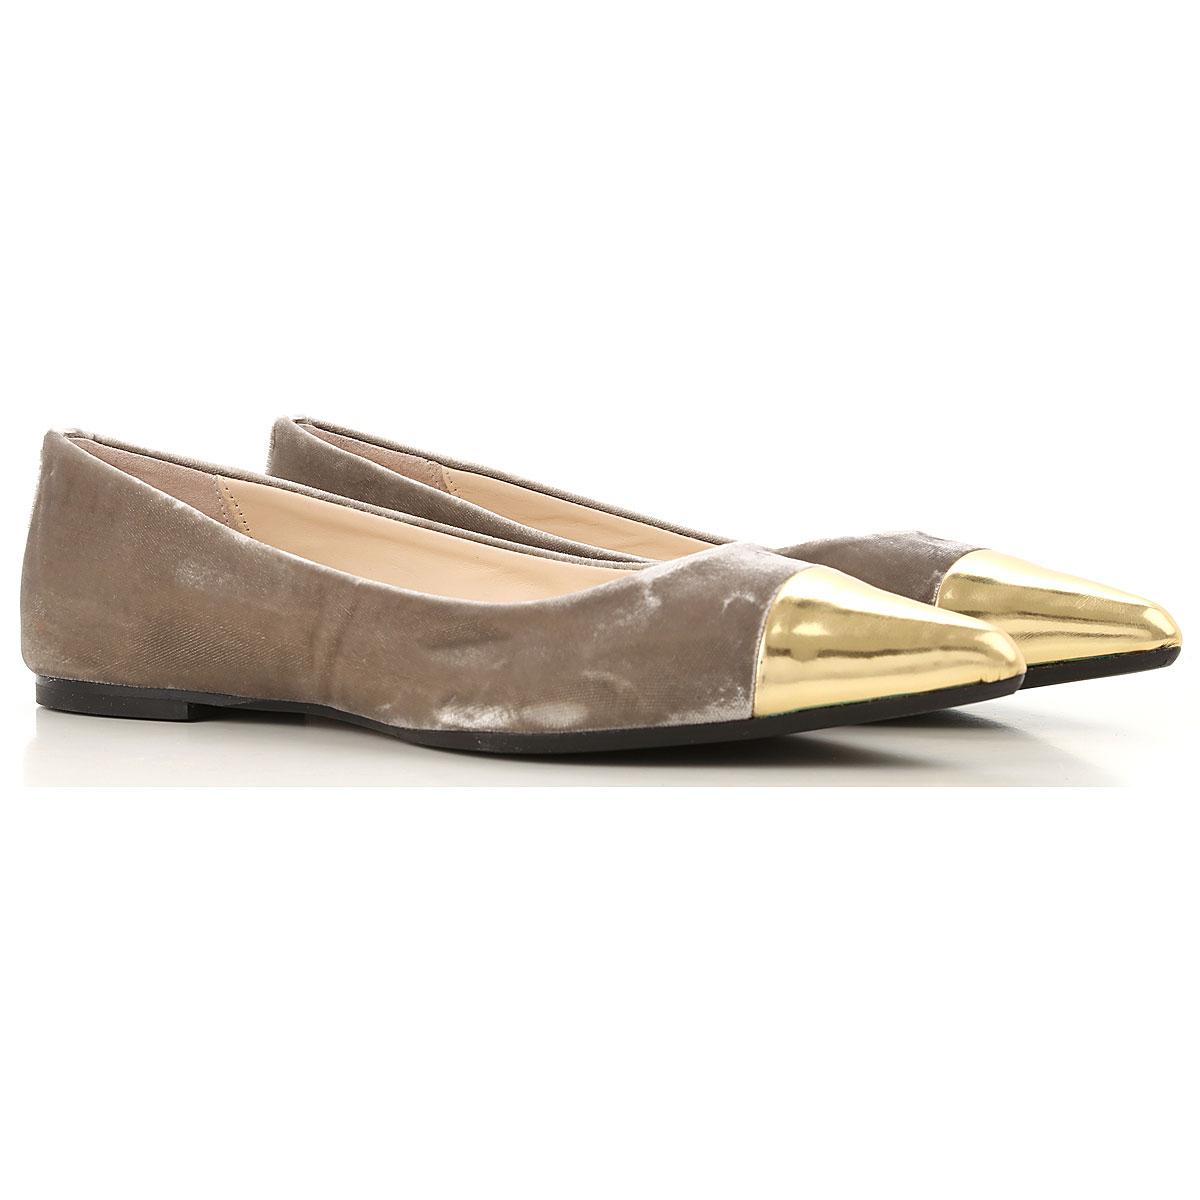 Image of Anna Baiguera Ballet Flats Ballerina Shoes for Women, Beaver, Velvet, 2017, 10 11 5 6 7 8